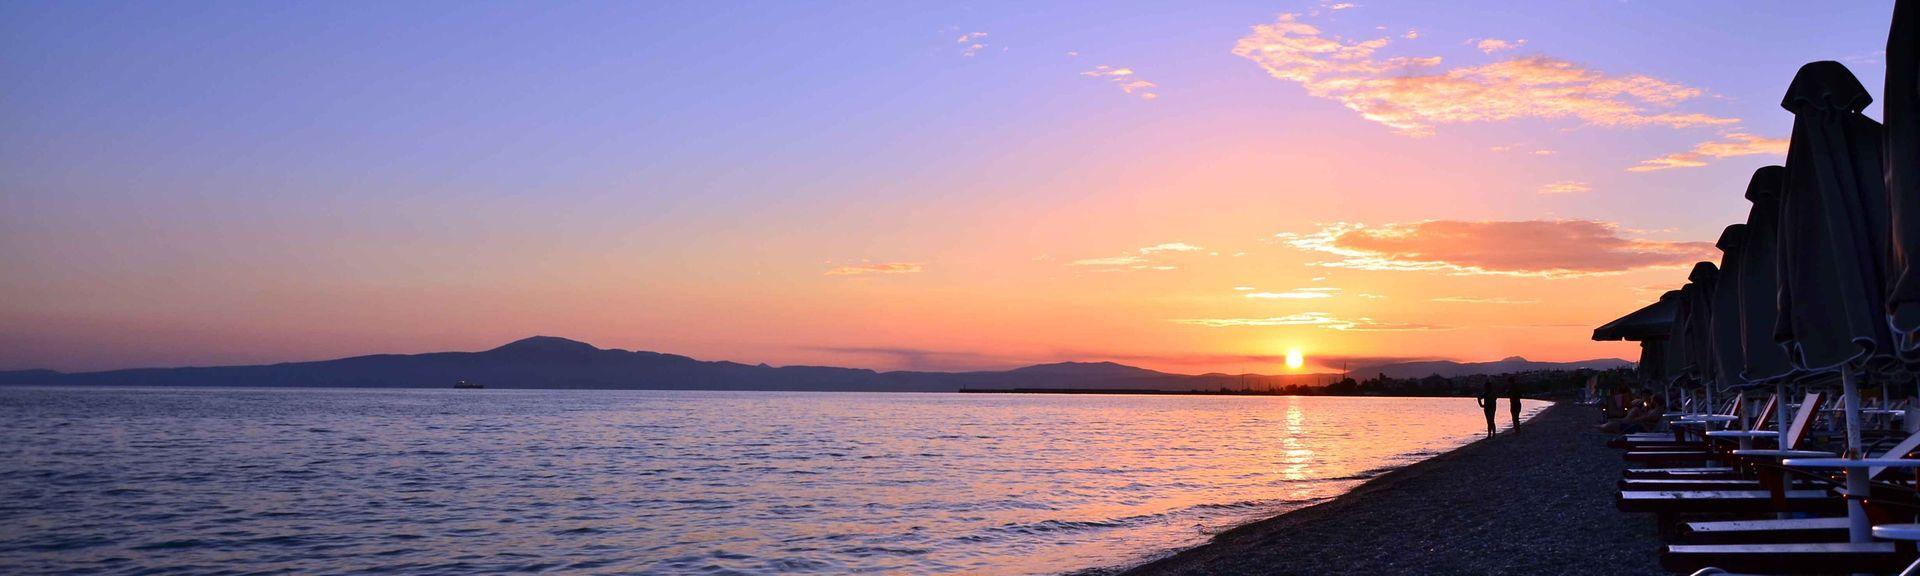 Megali Mantineia, West Mani, Peloponnese, Greece